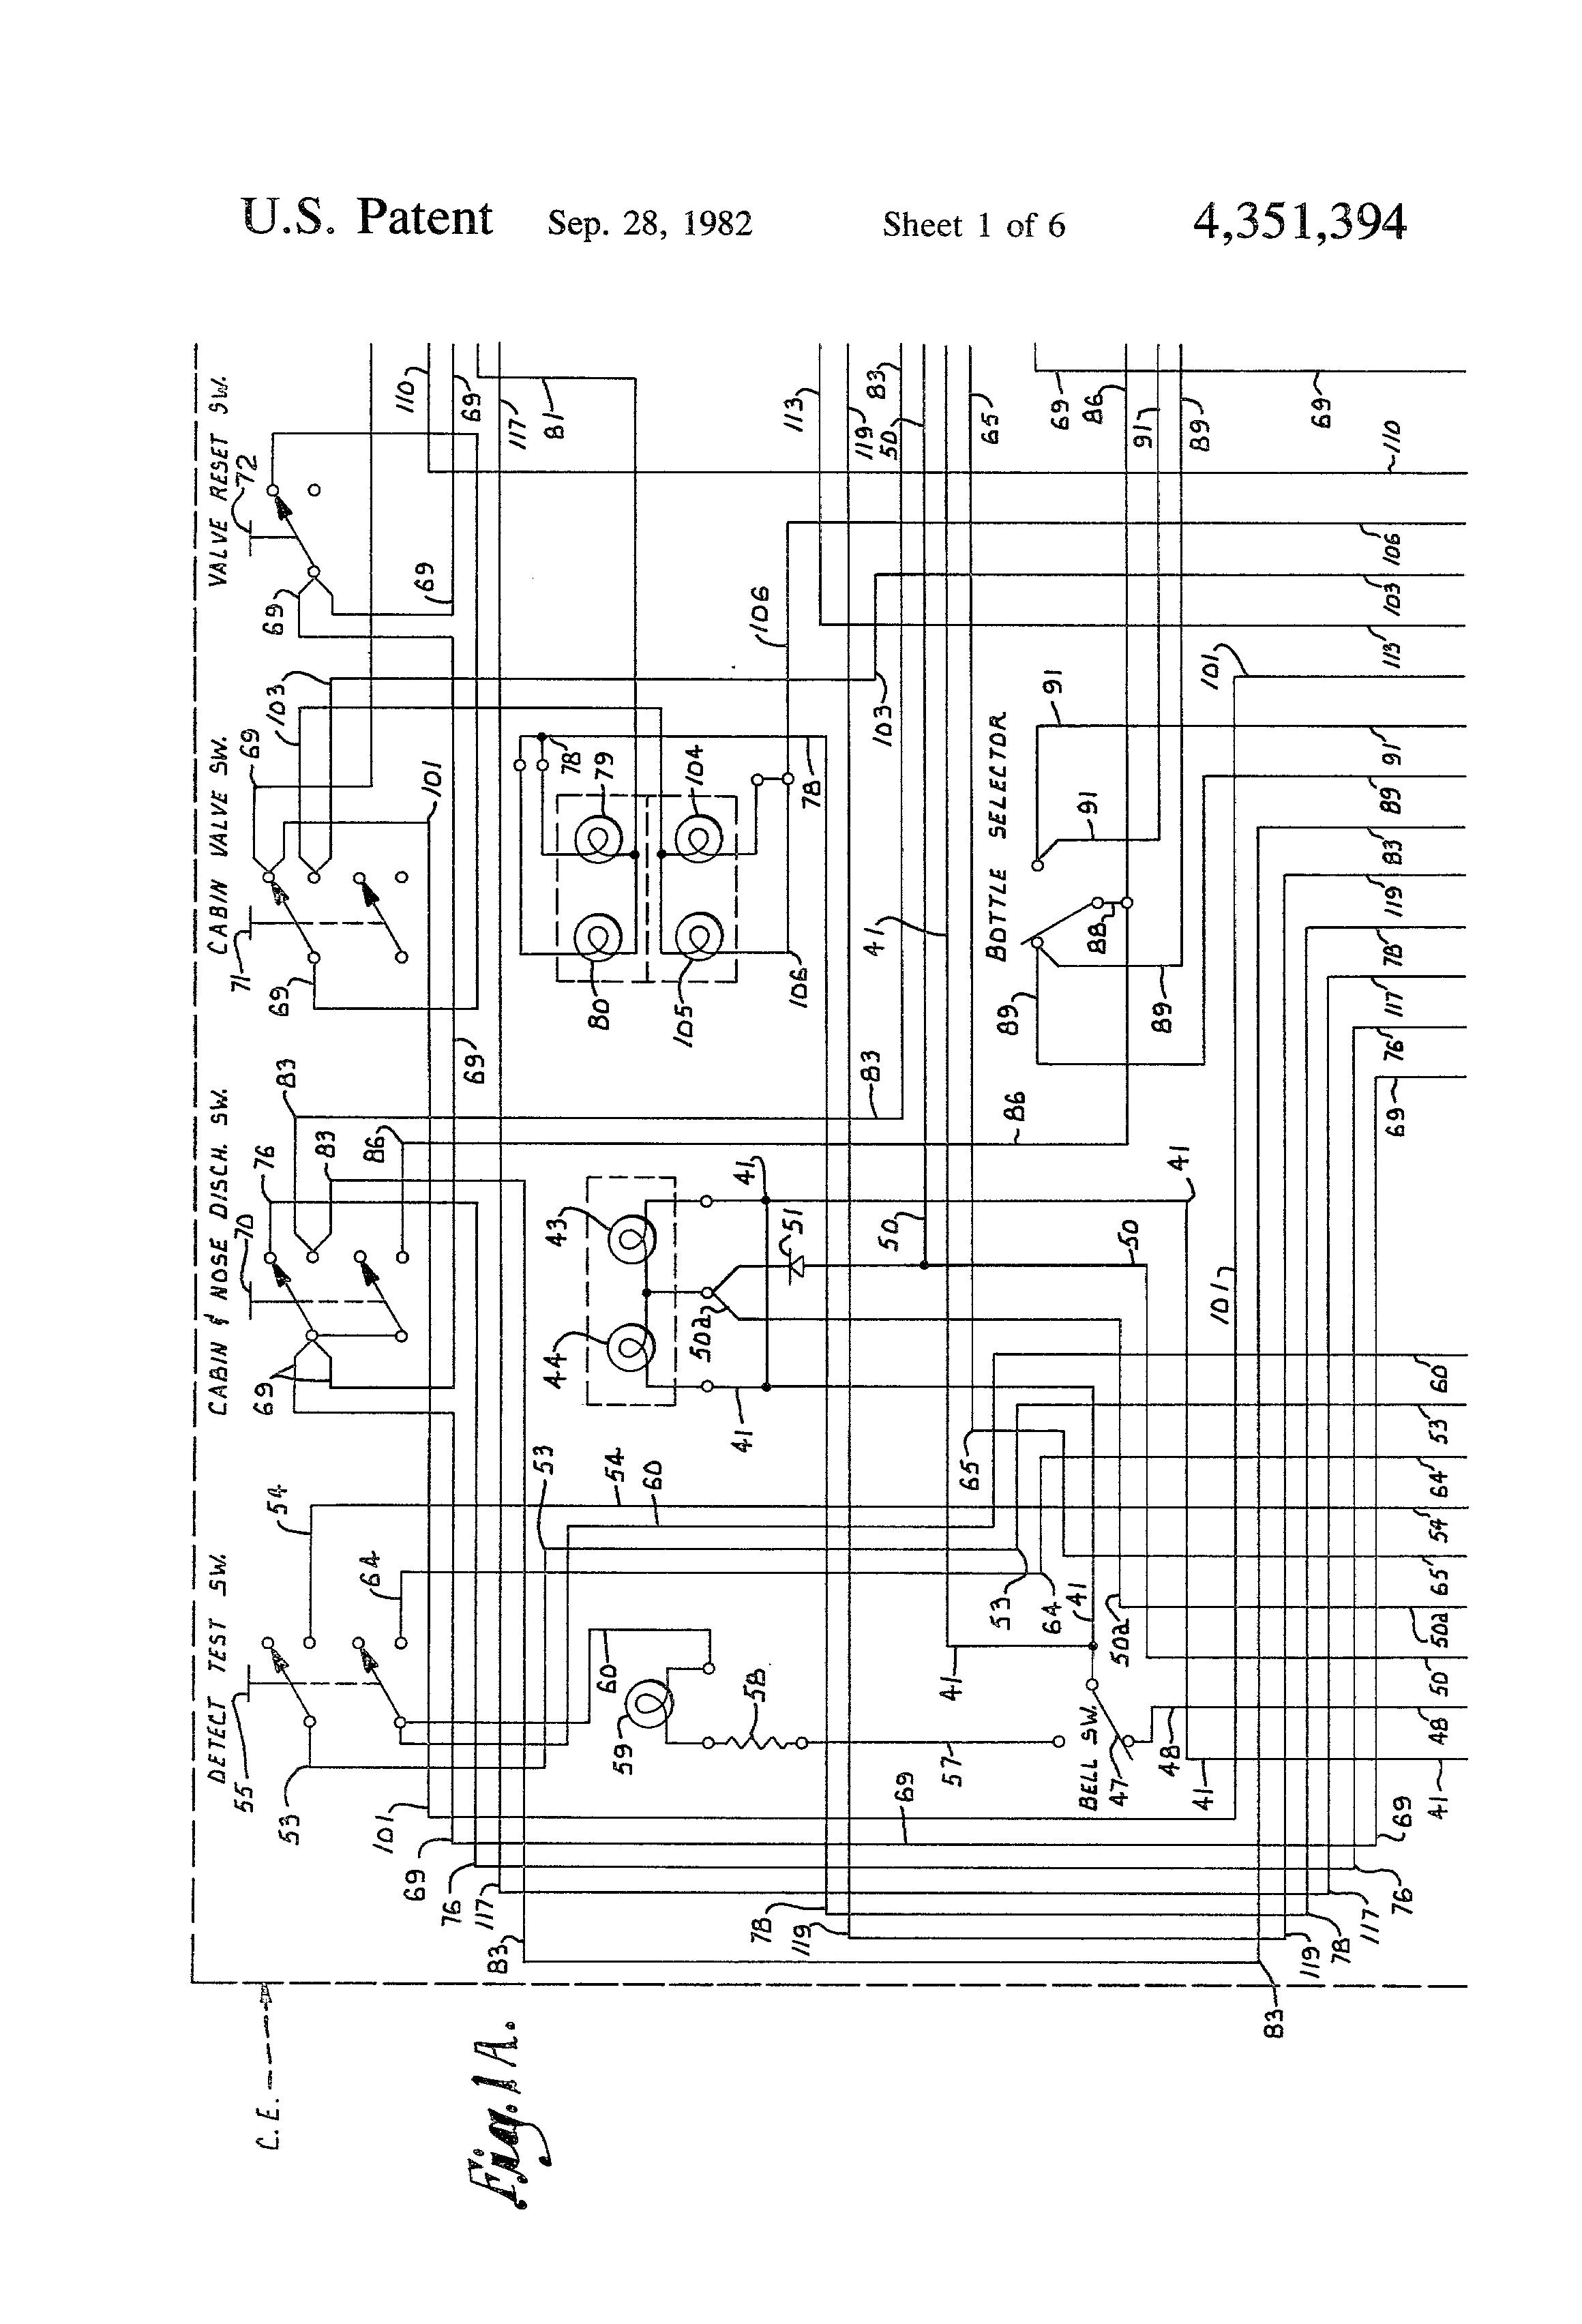 Wiring Diagram Additionally Aircraft Wiring Diagram On Aircraft